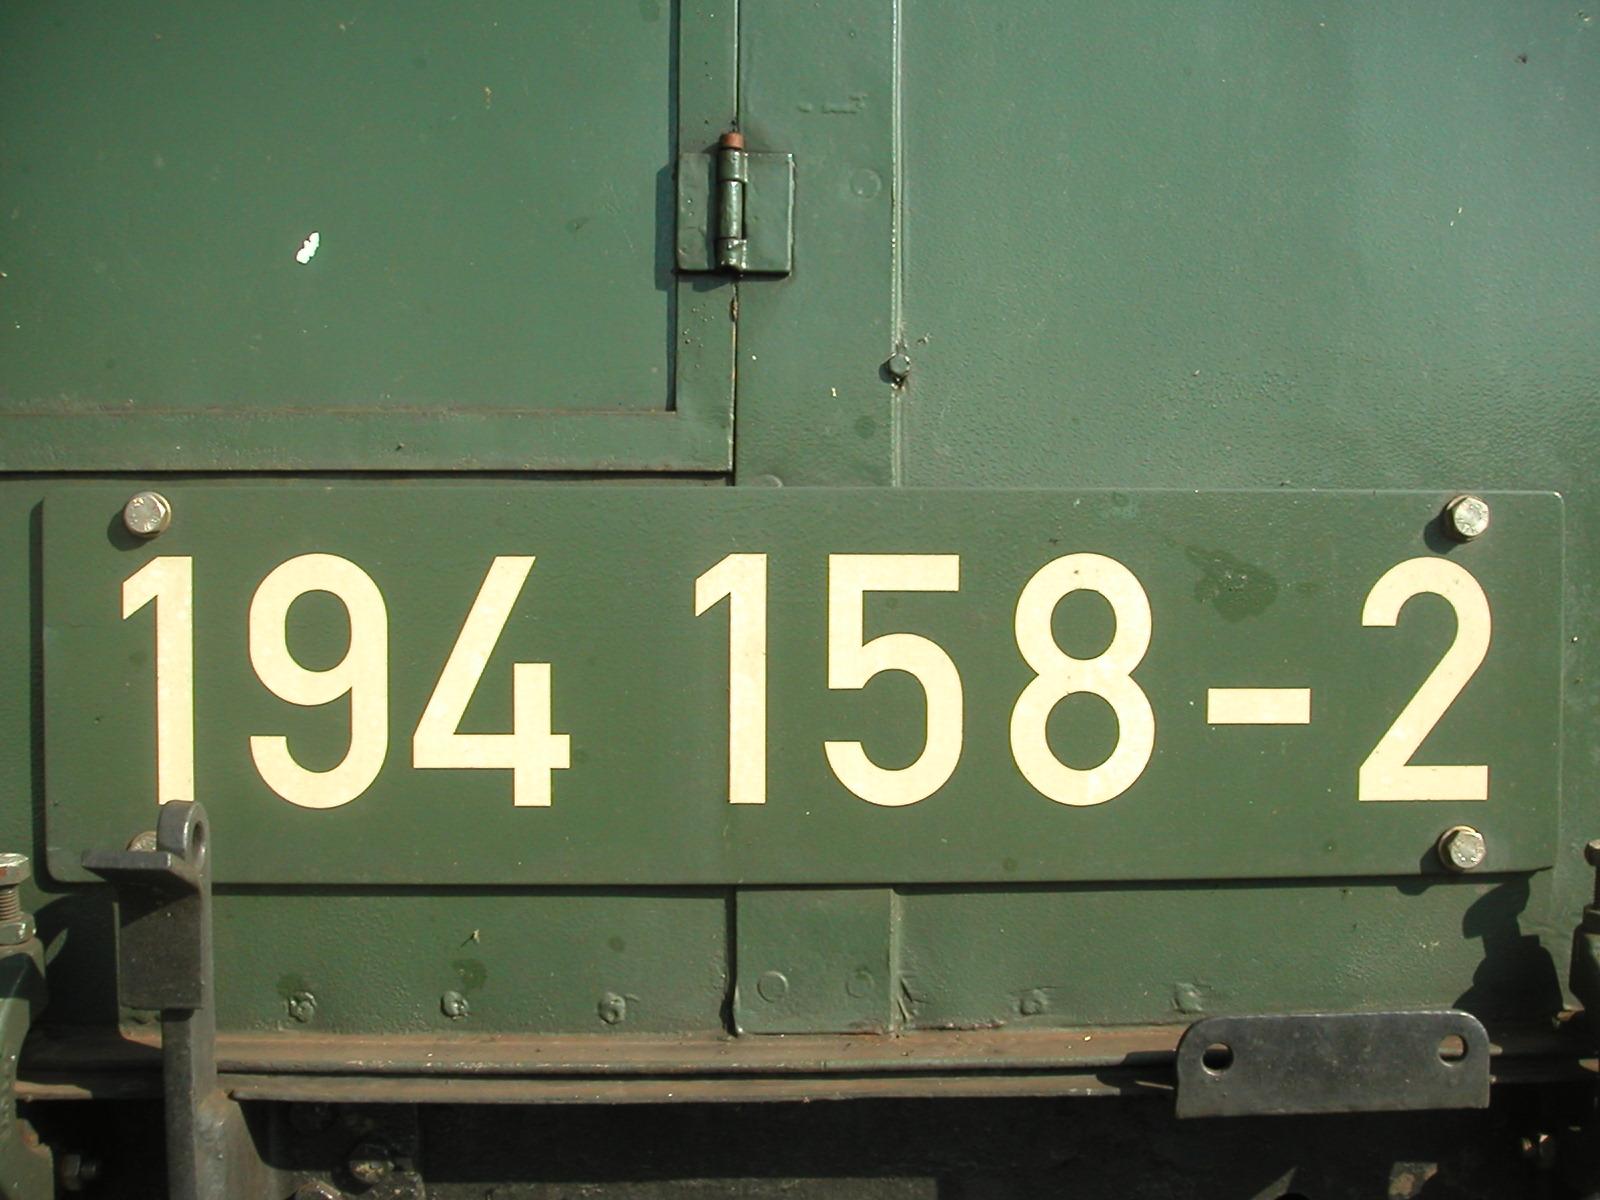 194 158-2